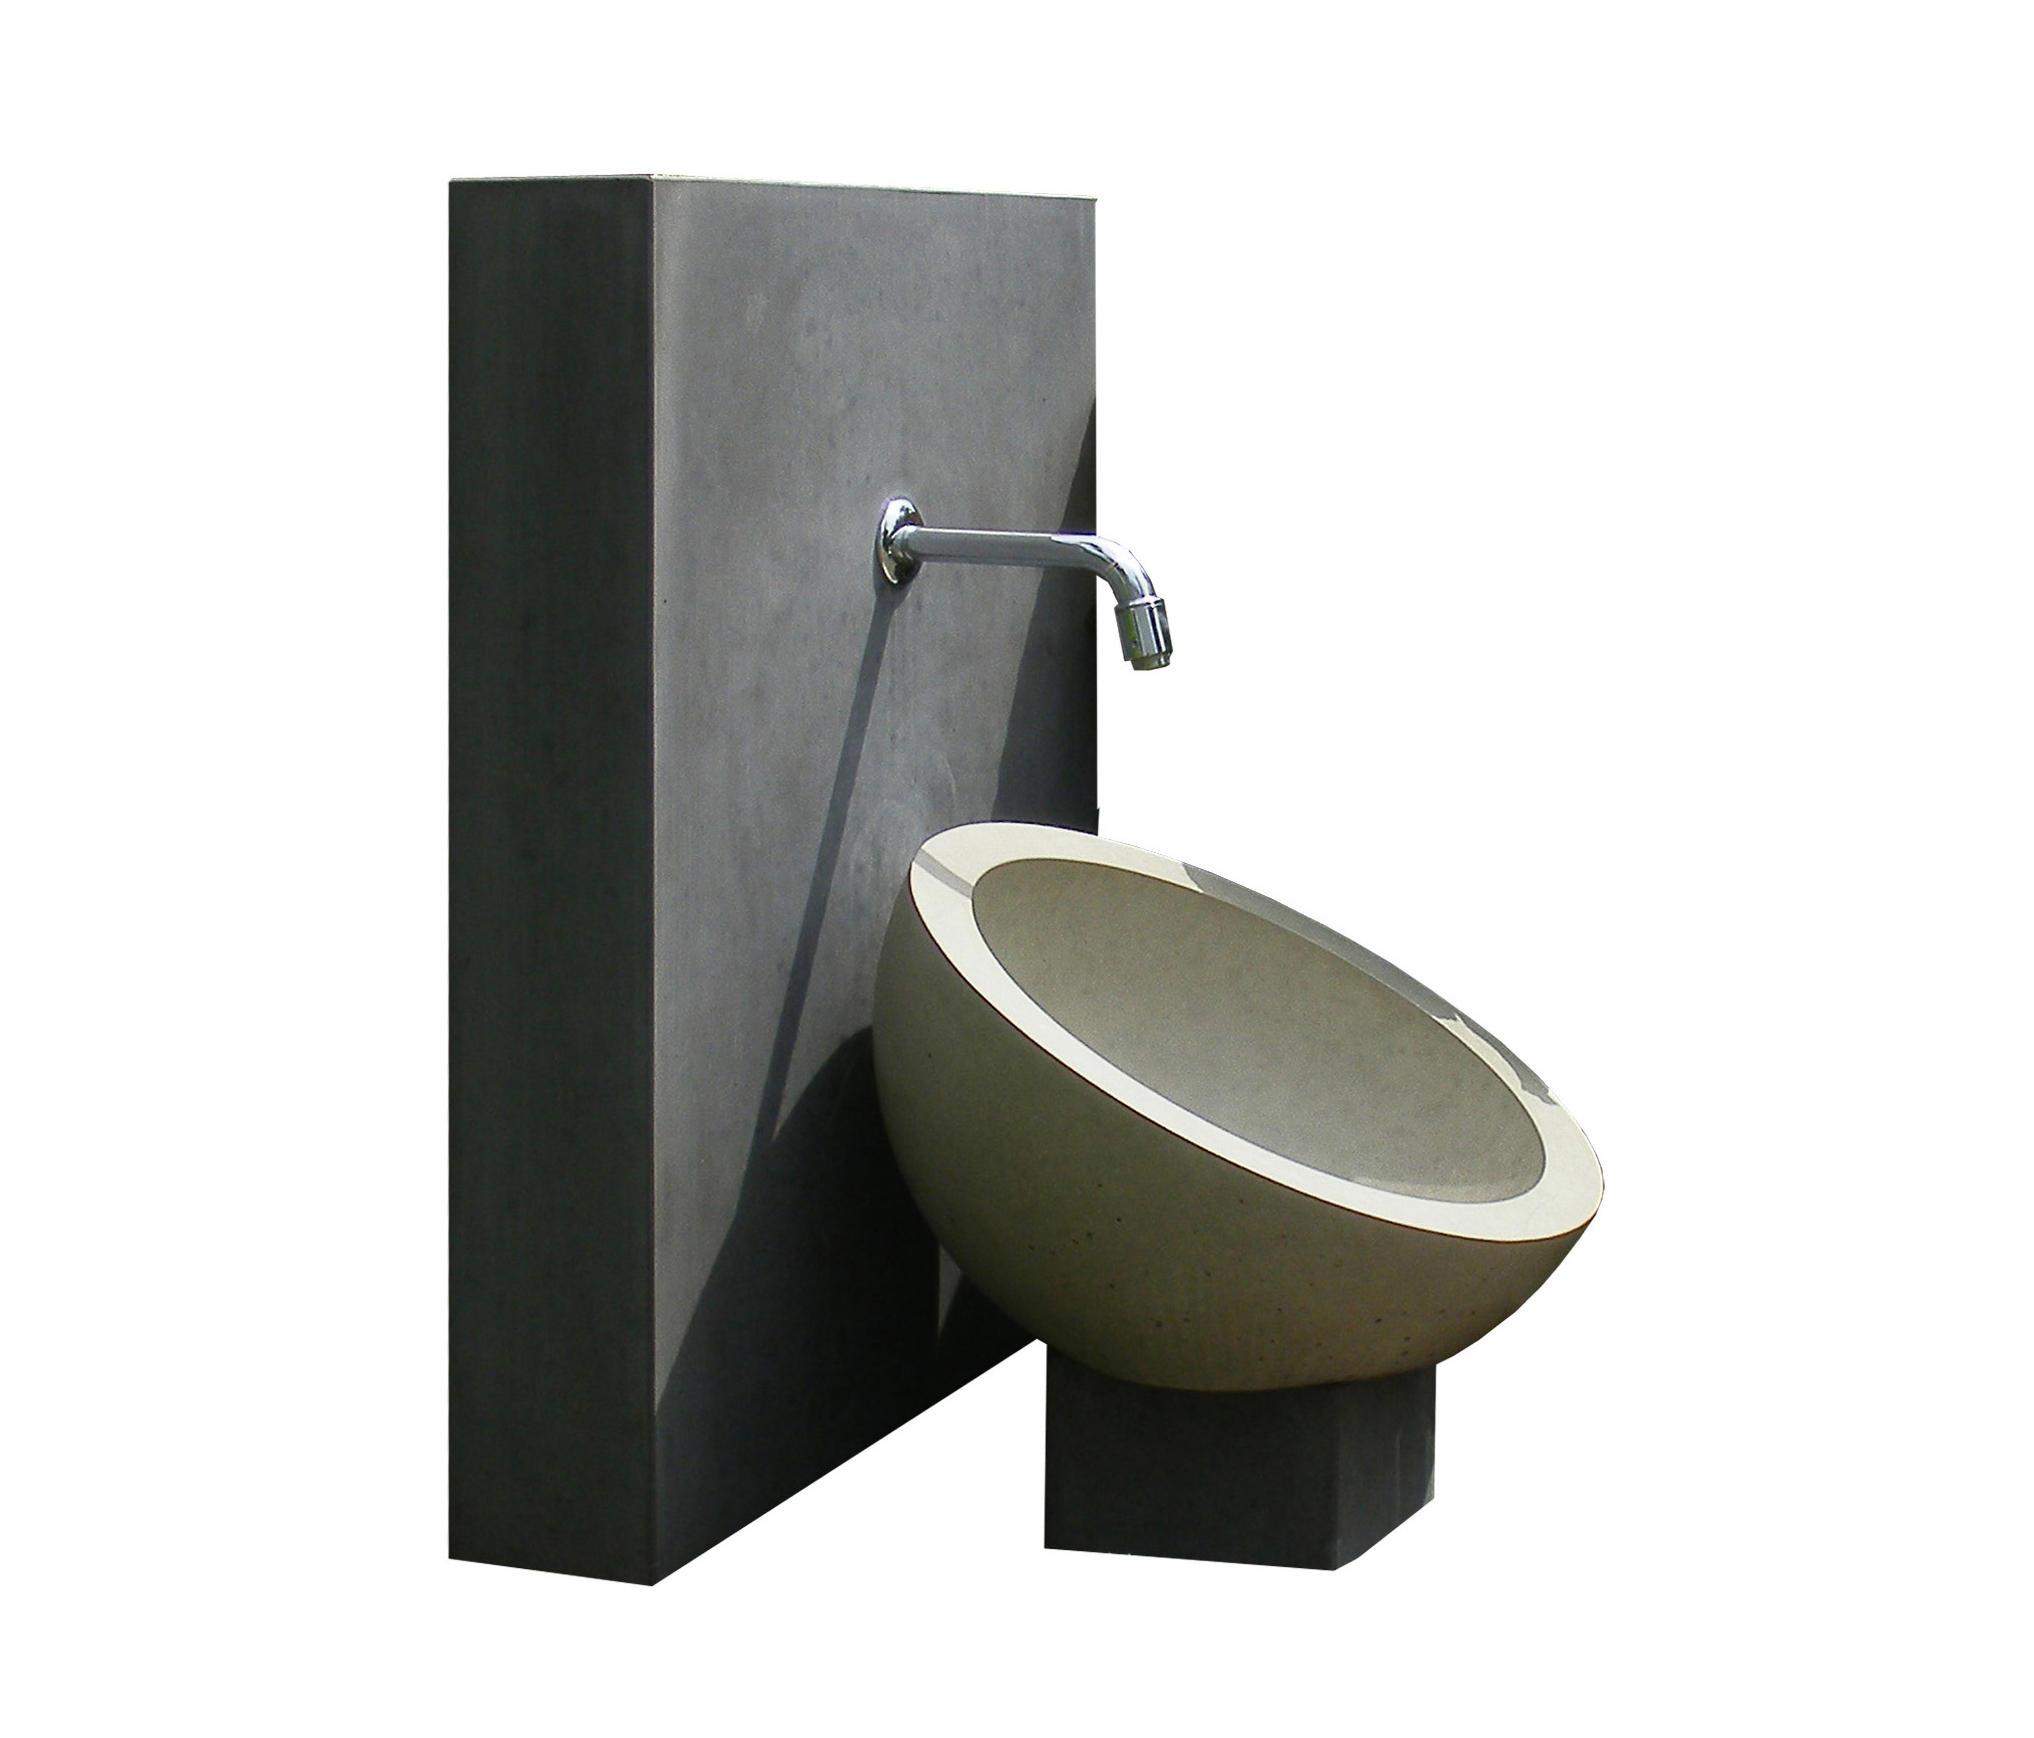 kaya garden washbasin drinking wells from oggi beton architonic. Black Bedroom Furniture Sets. Home Design Ideas